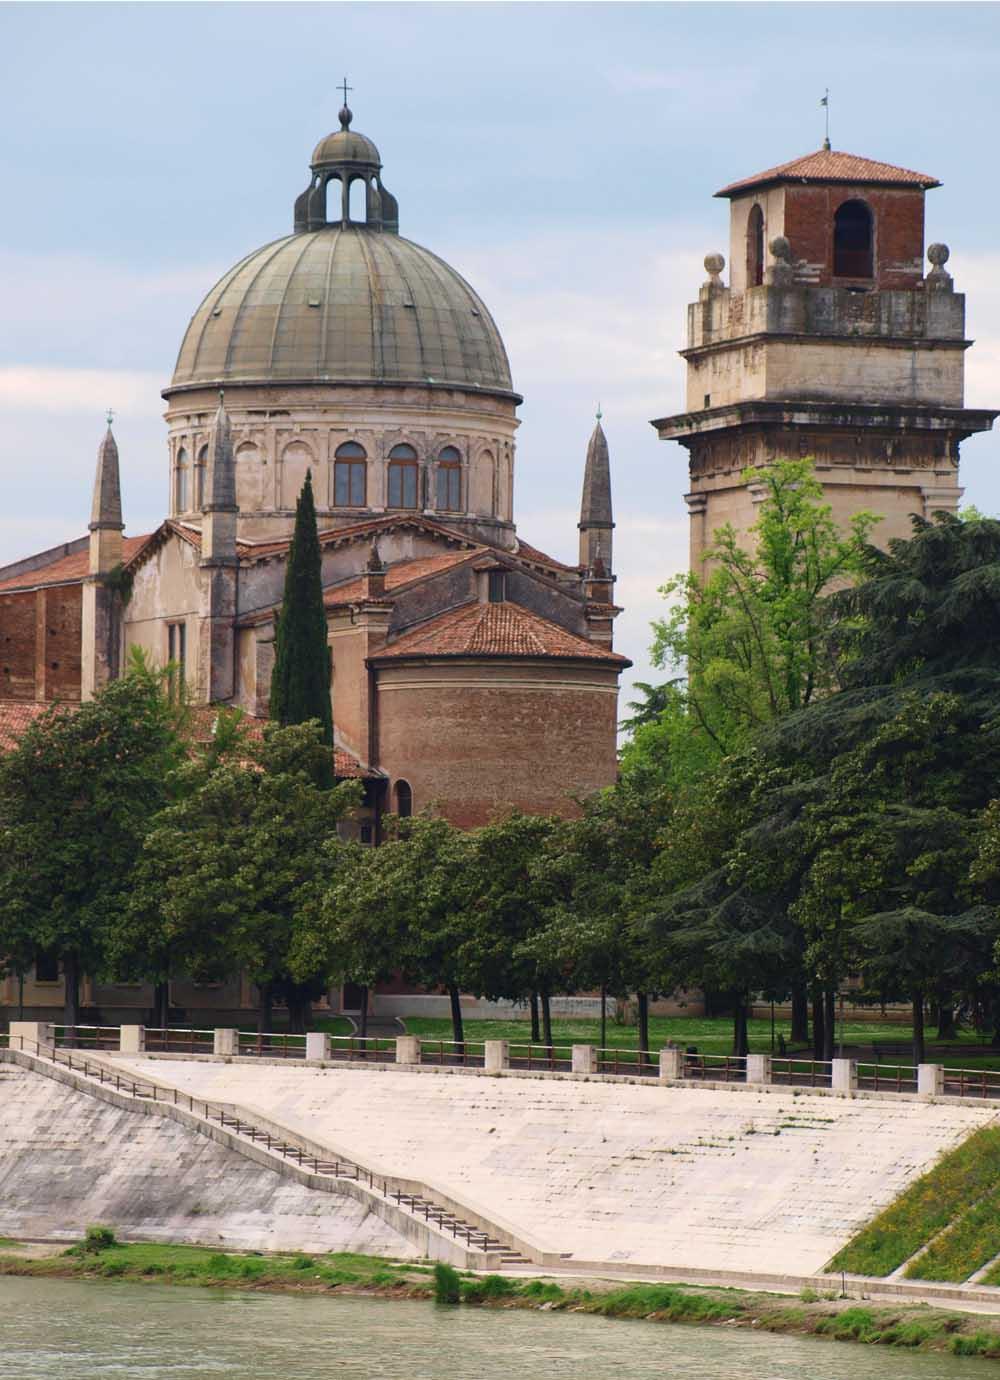 Tours - Verona and the architect Sanmicheli (photo 6)